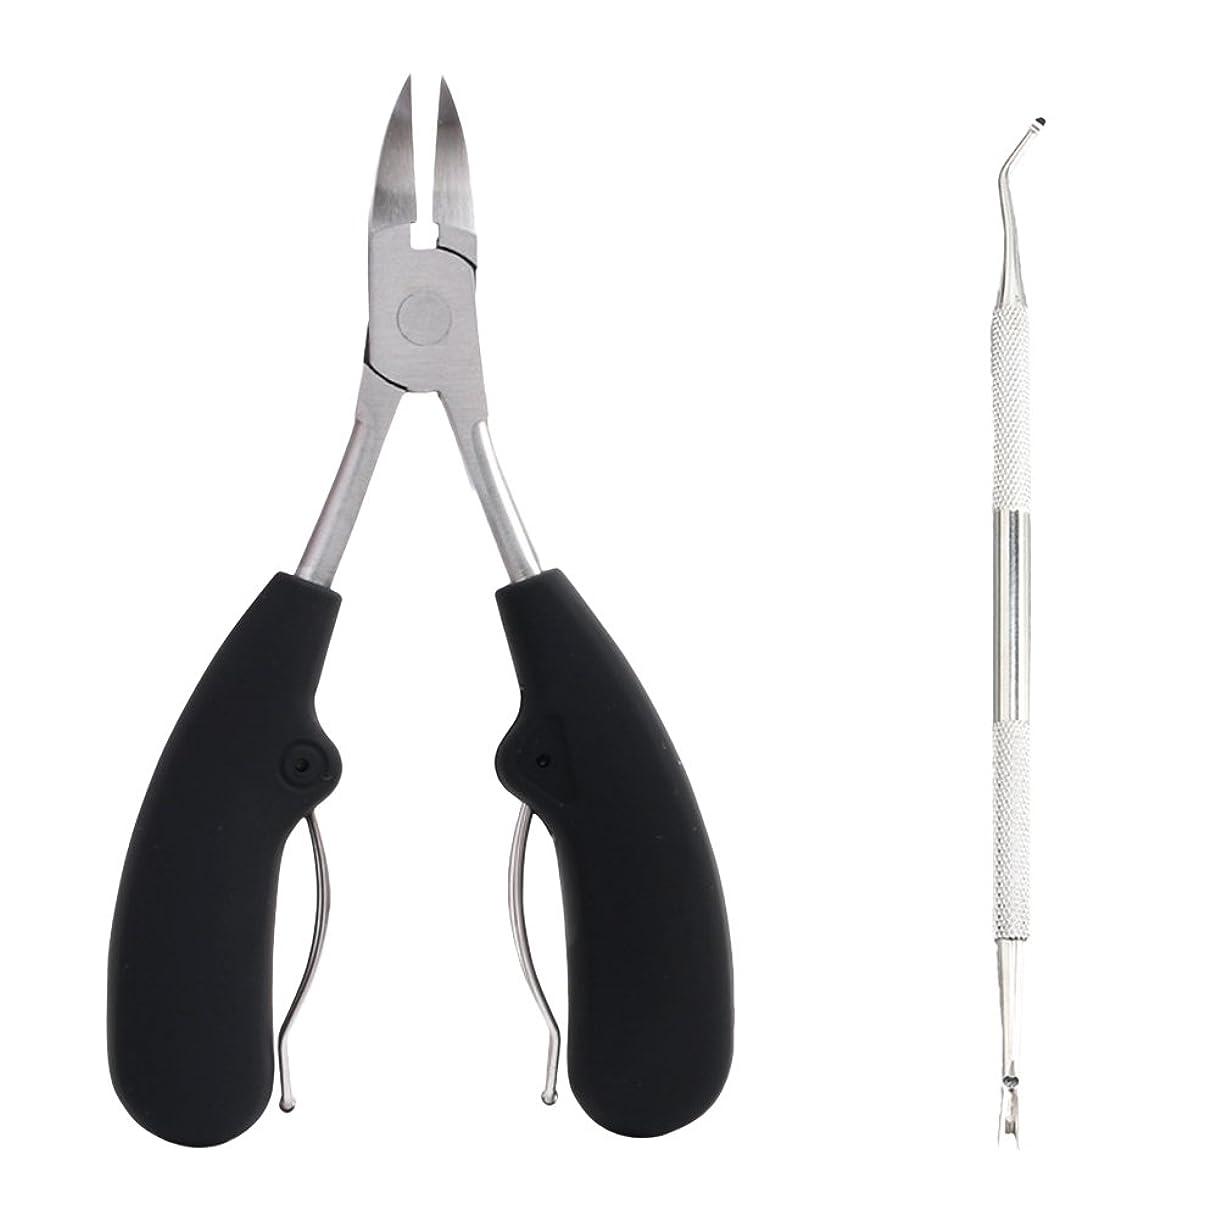 HEALIFTY 厚手または育成爪用2本の足首用クリッパー - ヘビーデューティーステンレススチールグリップトウネイルカッター